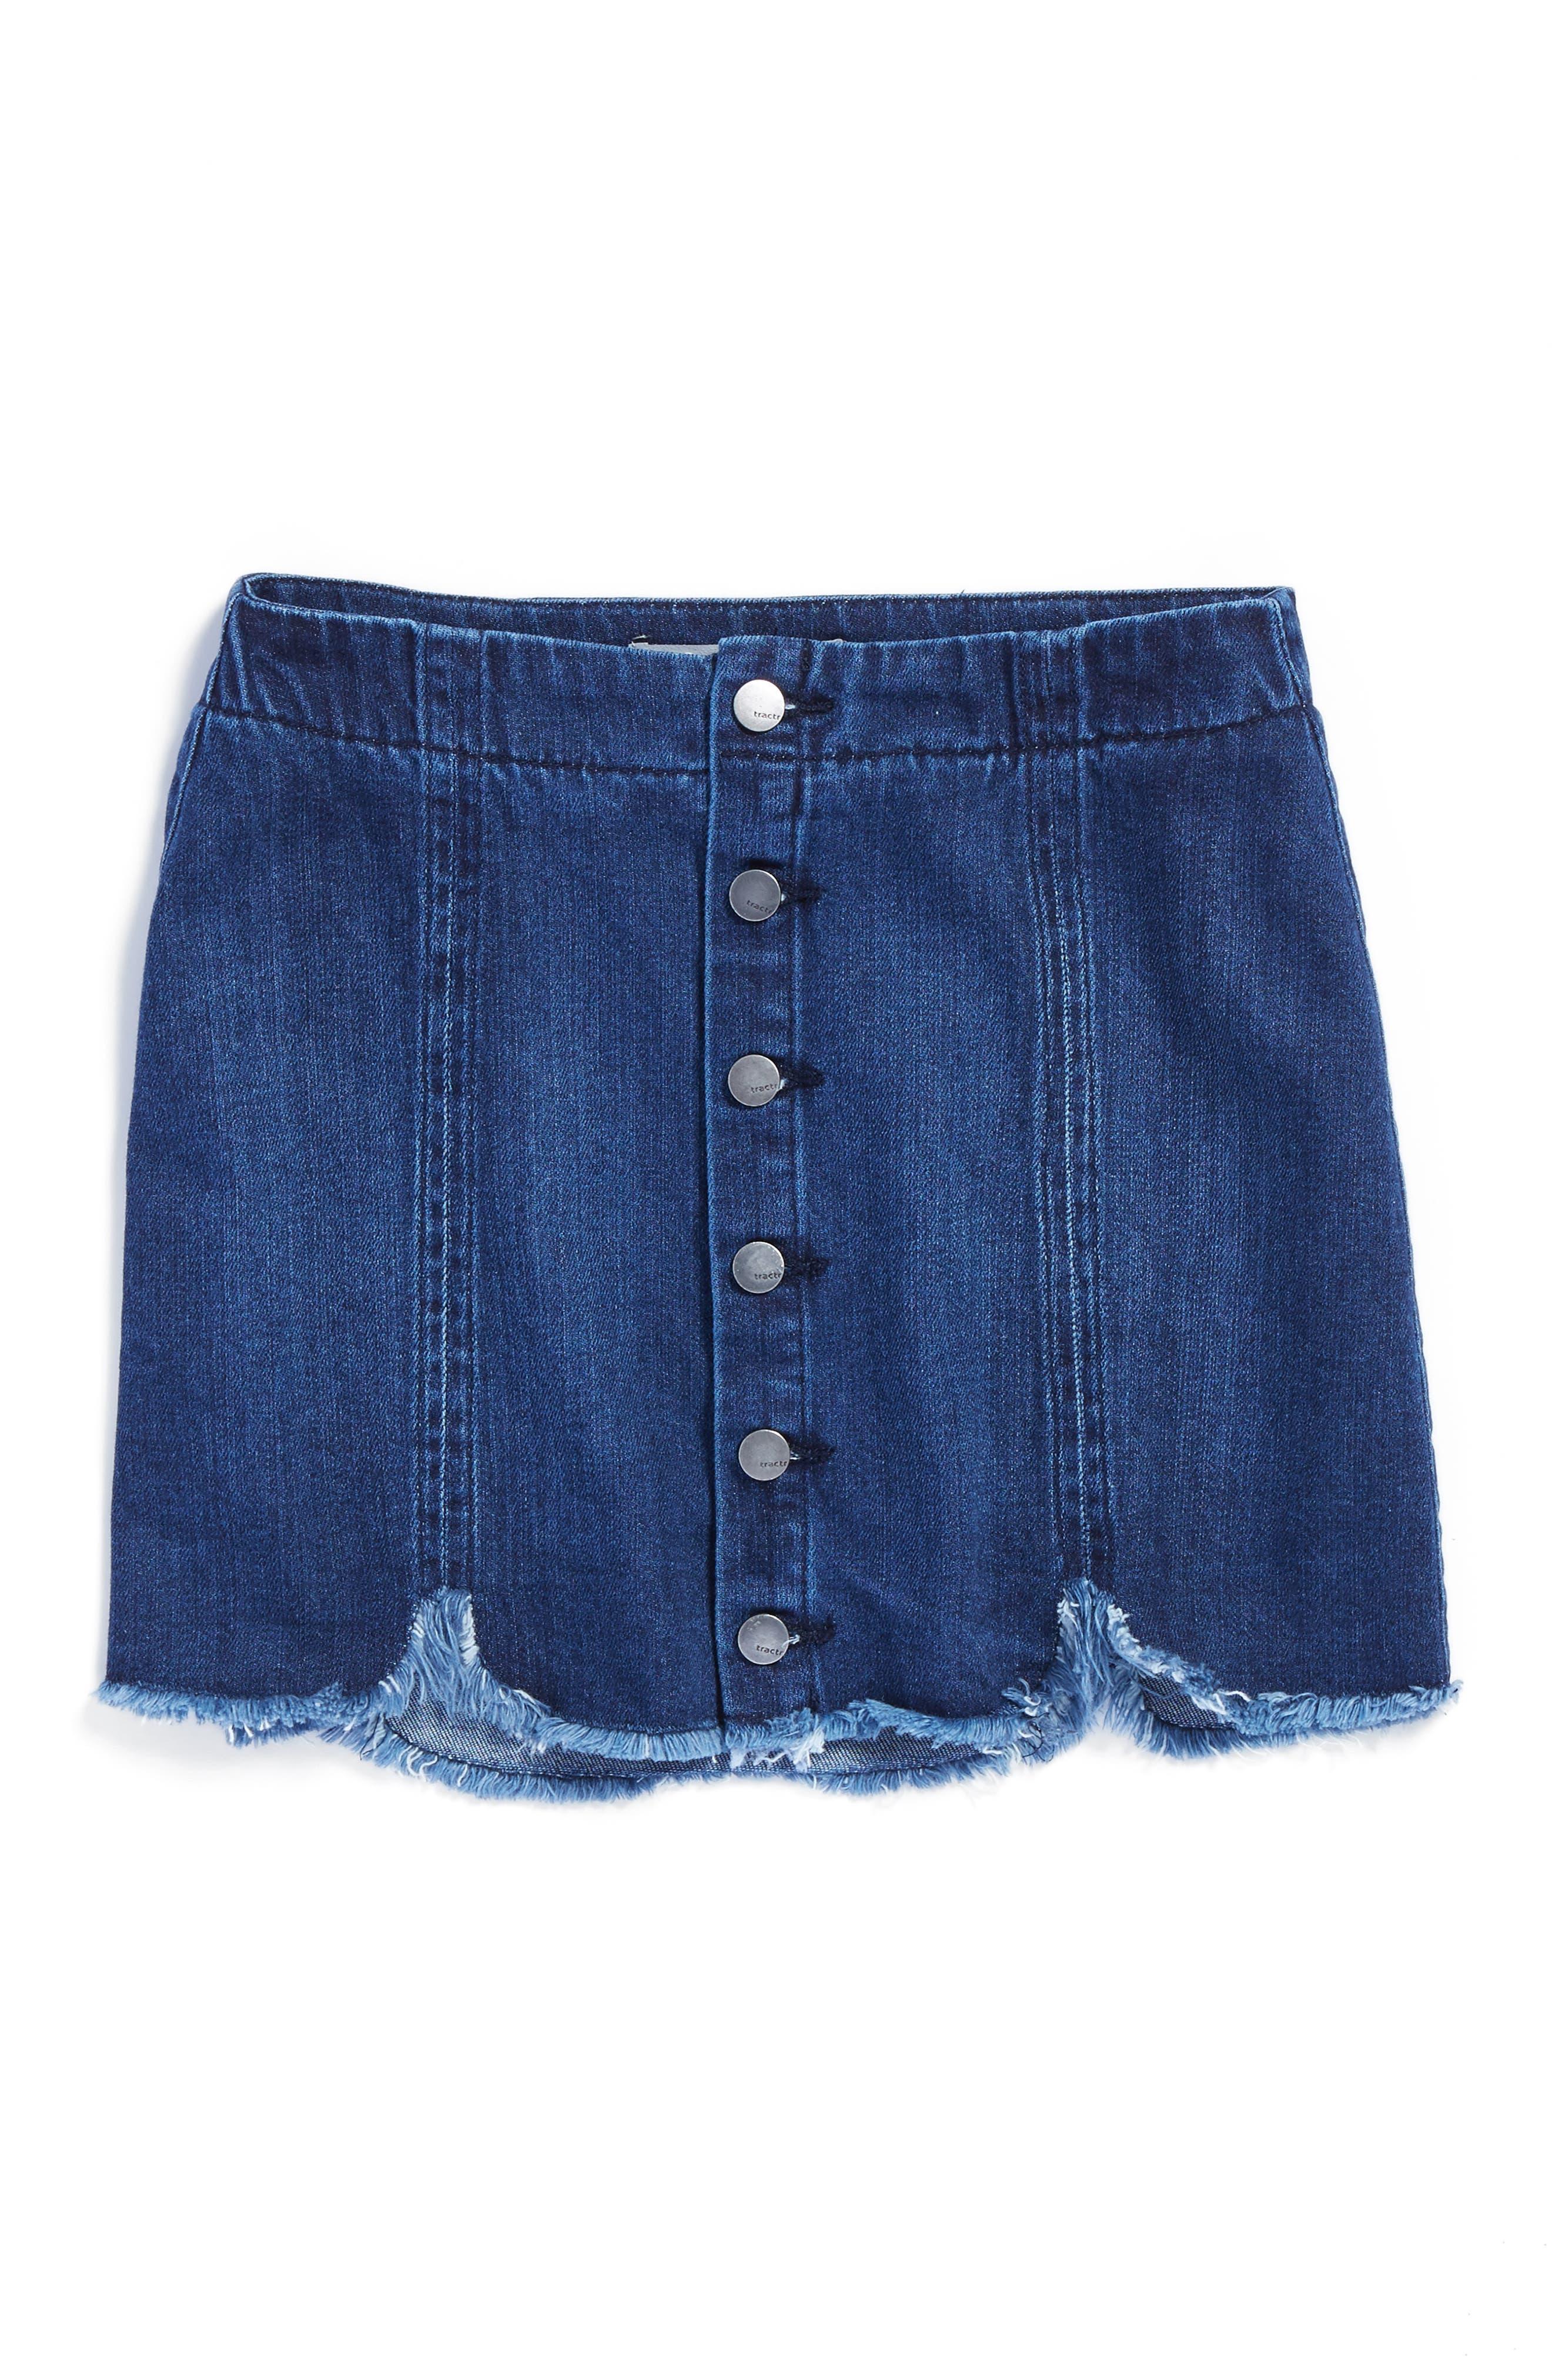 Frayed Scallop Denim Skirt,                         Main,                         color, 407